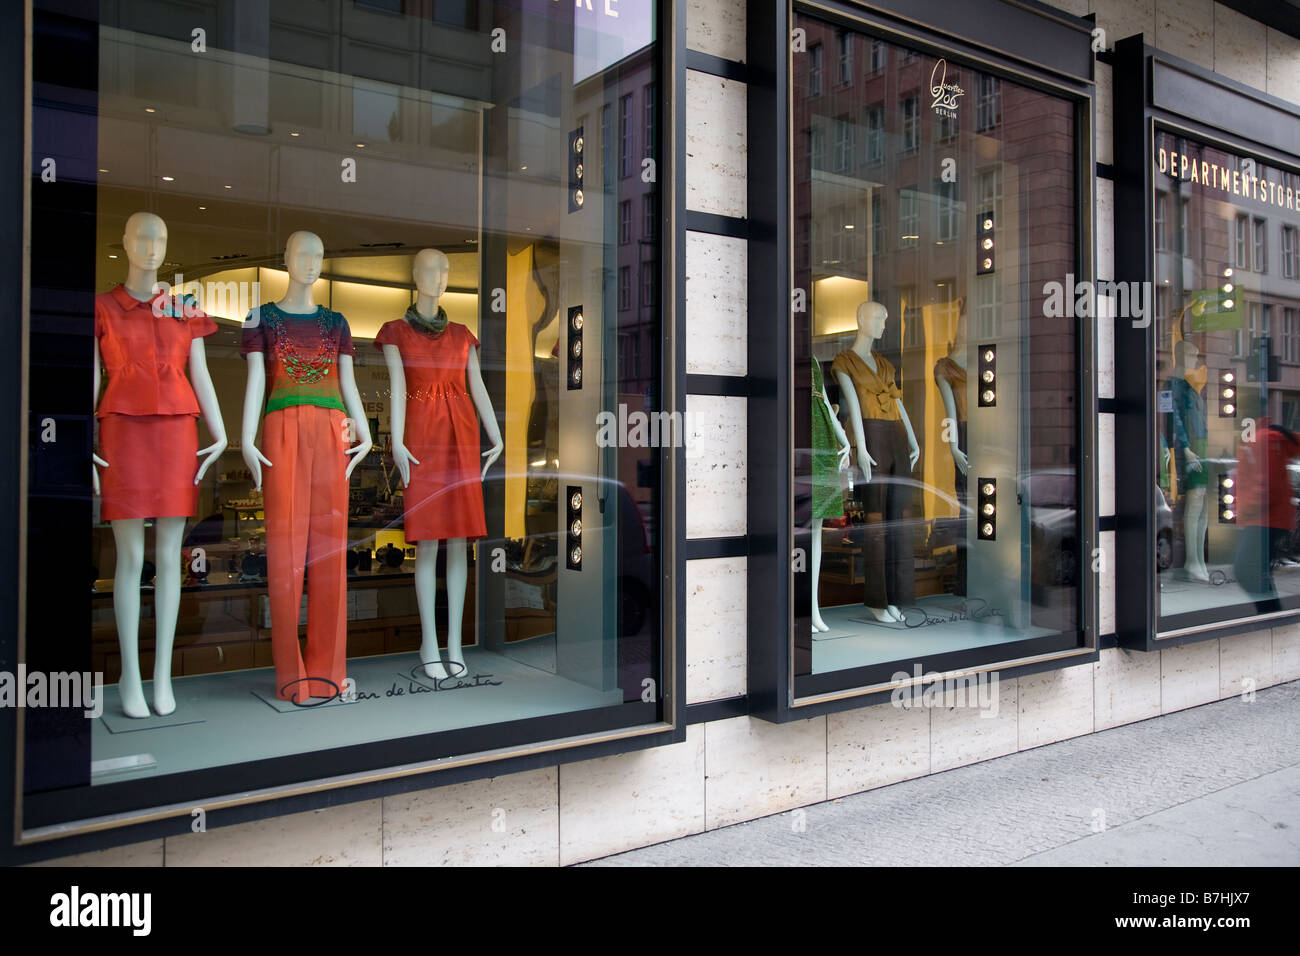 677fdea8185cb Louis Vuitton dept store in Berlin Stock Photo  21900991 - Alamy